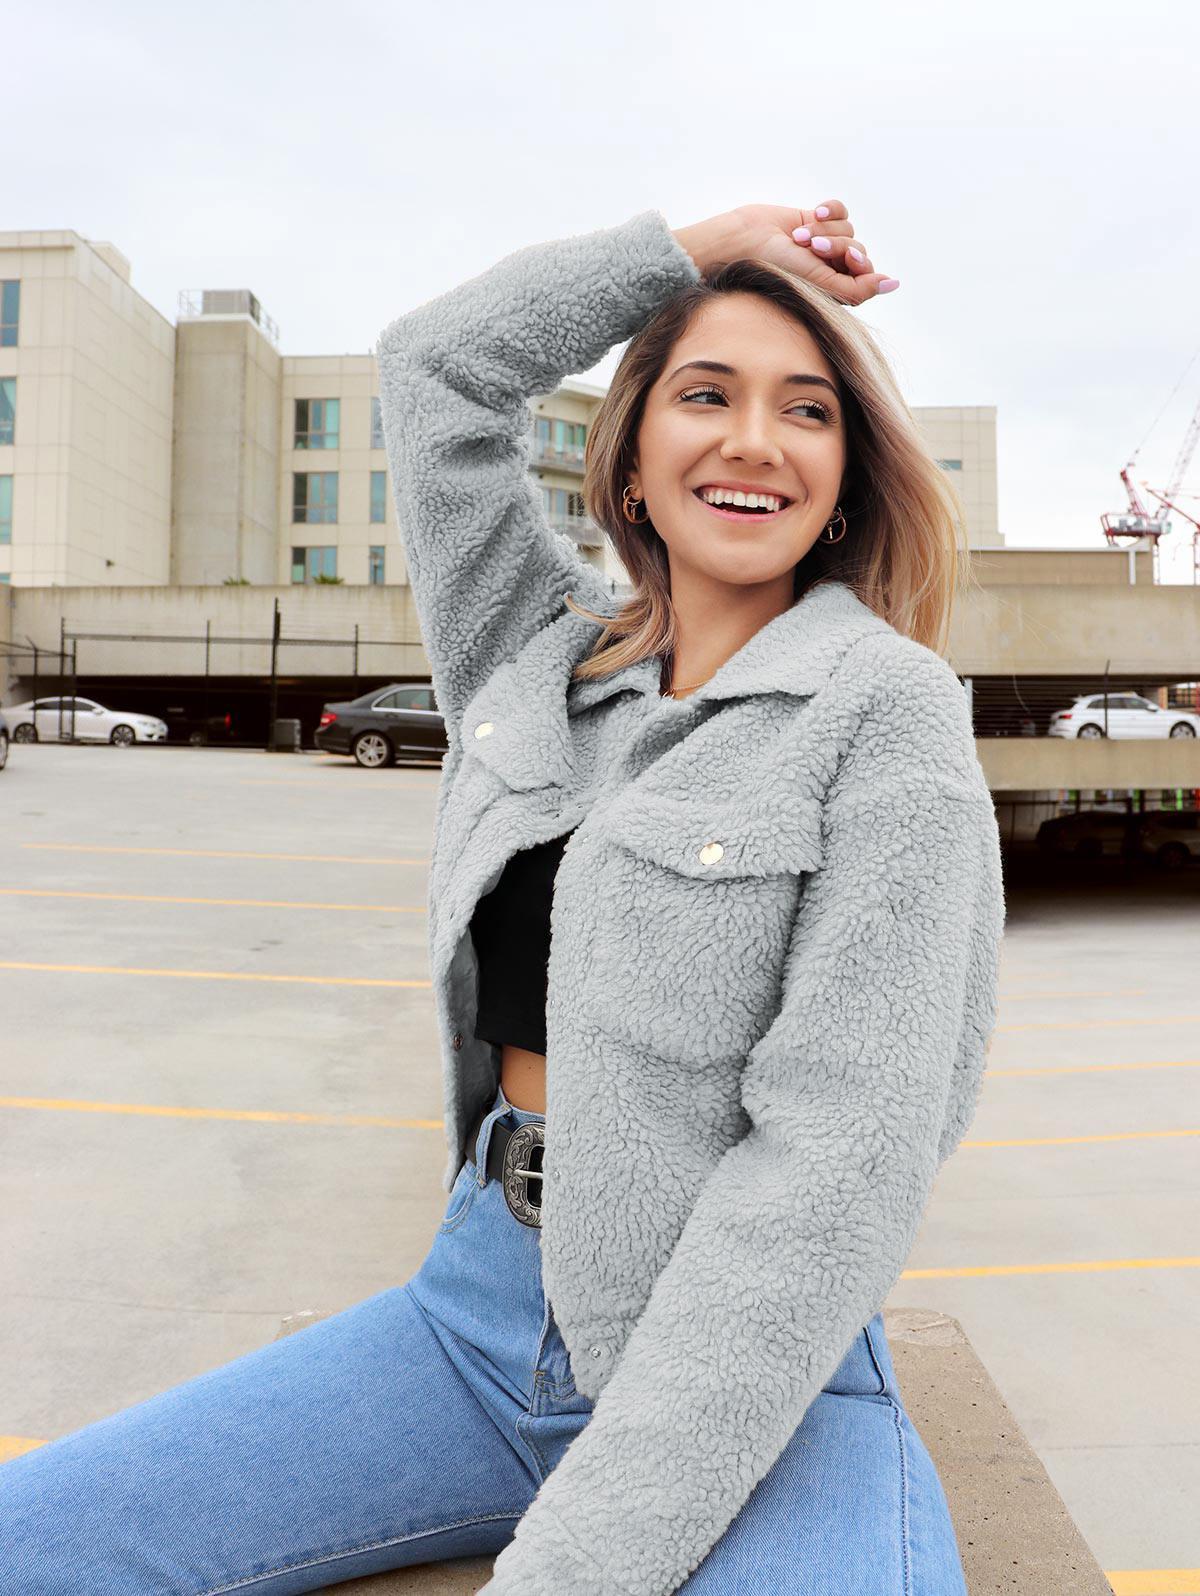 ZAFUL x Yasmine Bateman Snap Button Pockets Faux Fur Jacket thumbnail